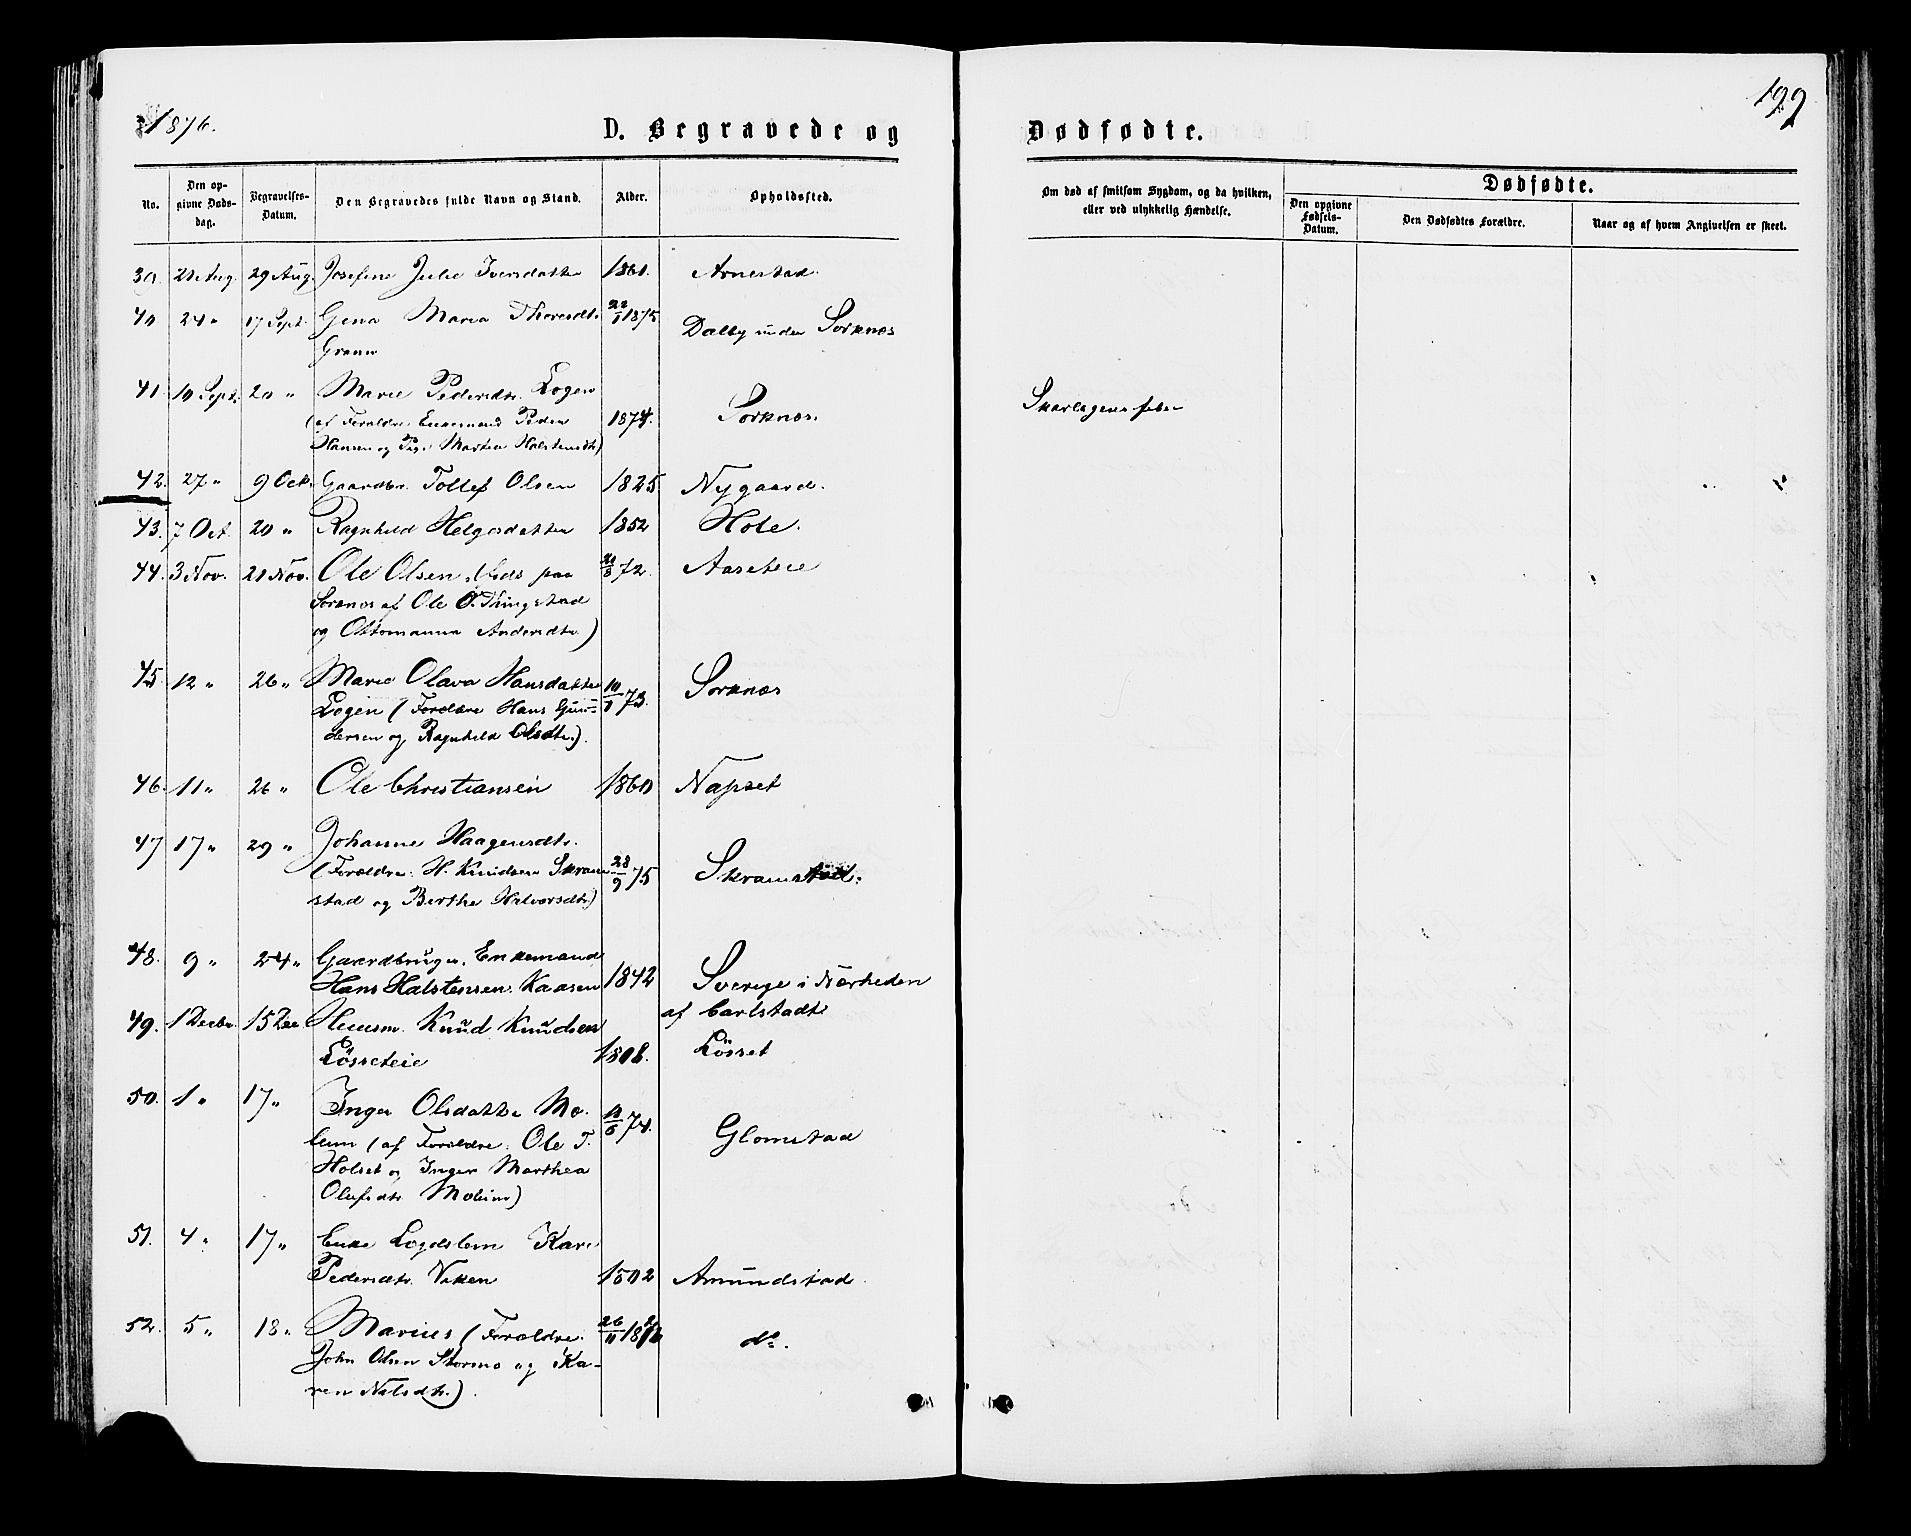 SAH, Åmot prestekontor, Ministerialbok nr. 9, 1875-1883, s. 199